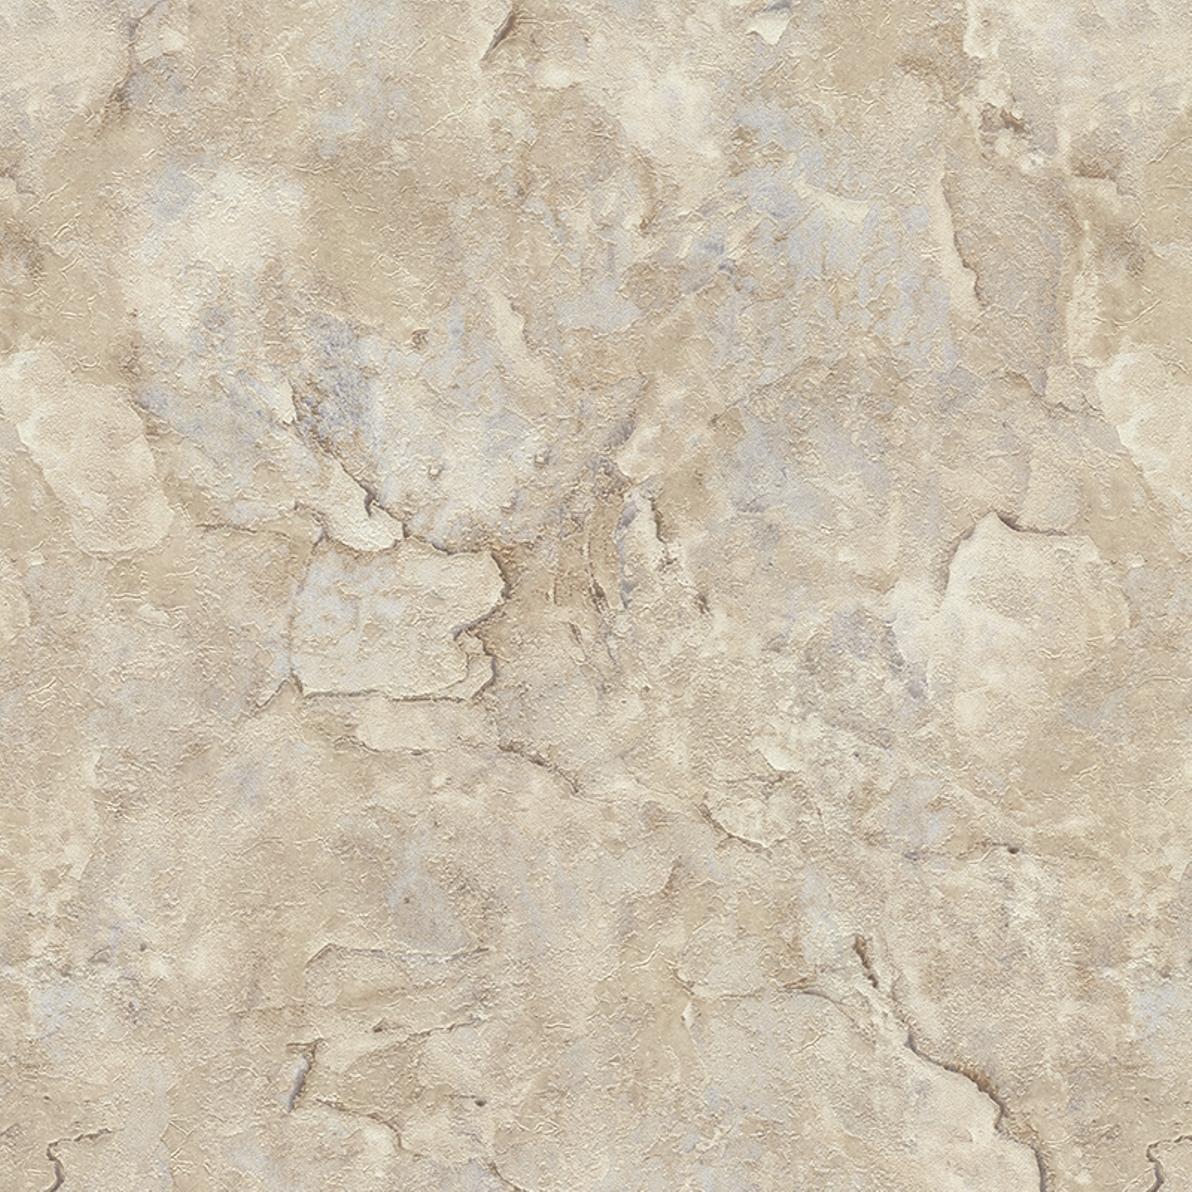 Обои Decori & Decori Carrara 82608